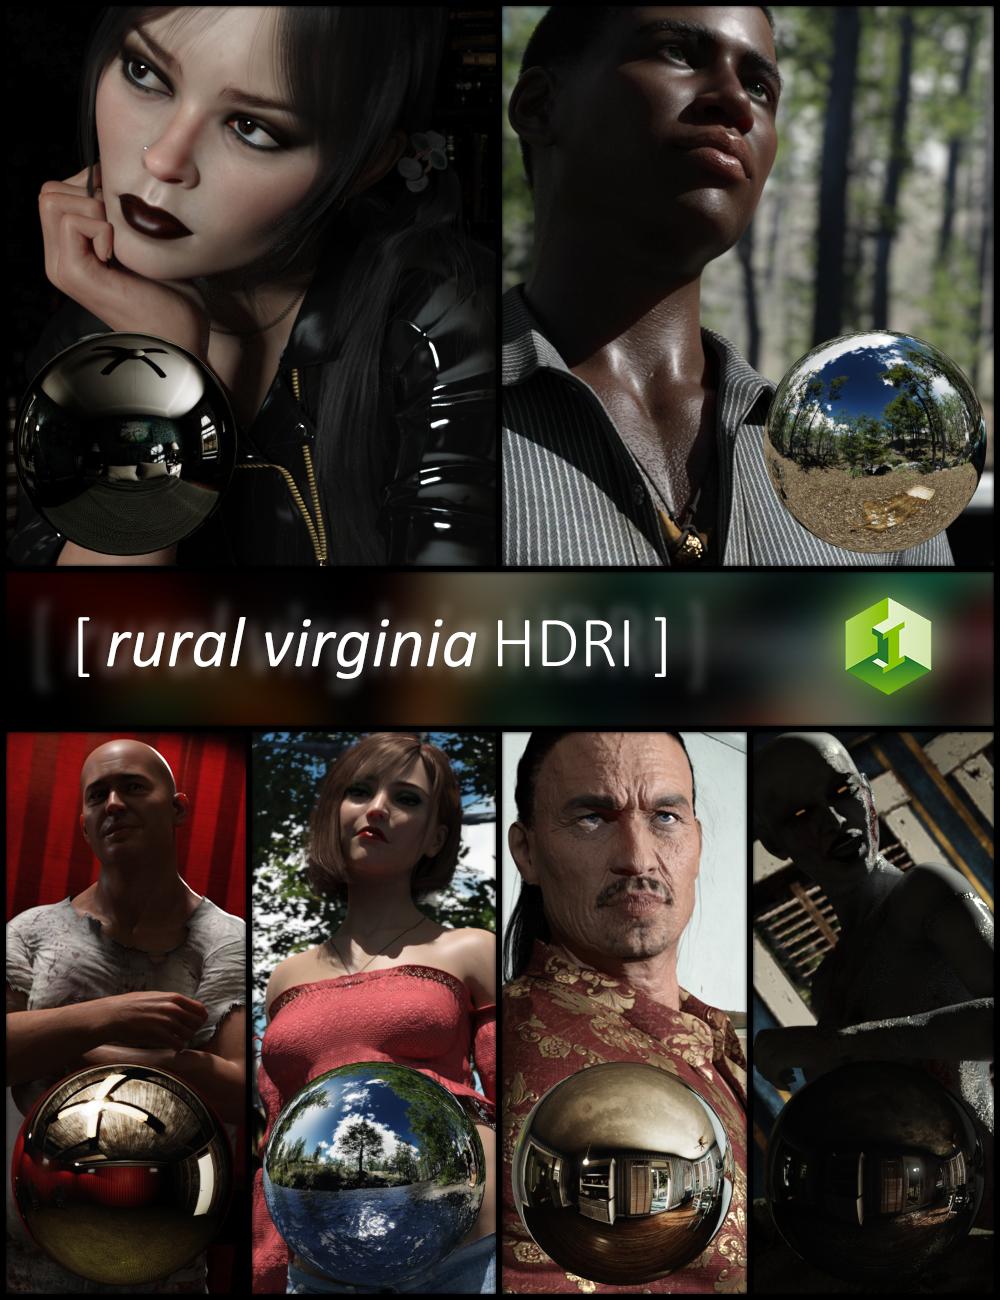 Rural Virginia HDRI by: JDA HDRI, 3D Models by Daz 3D